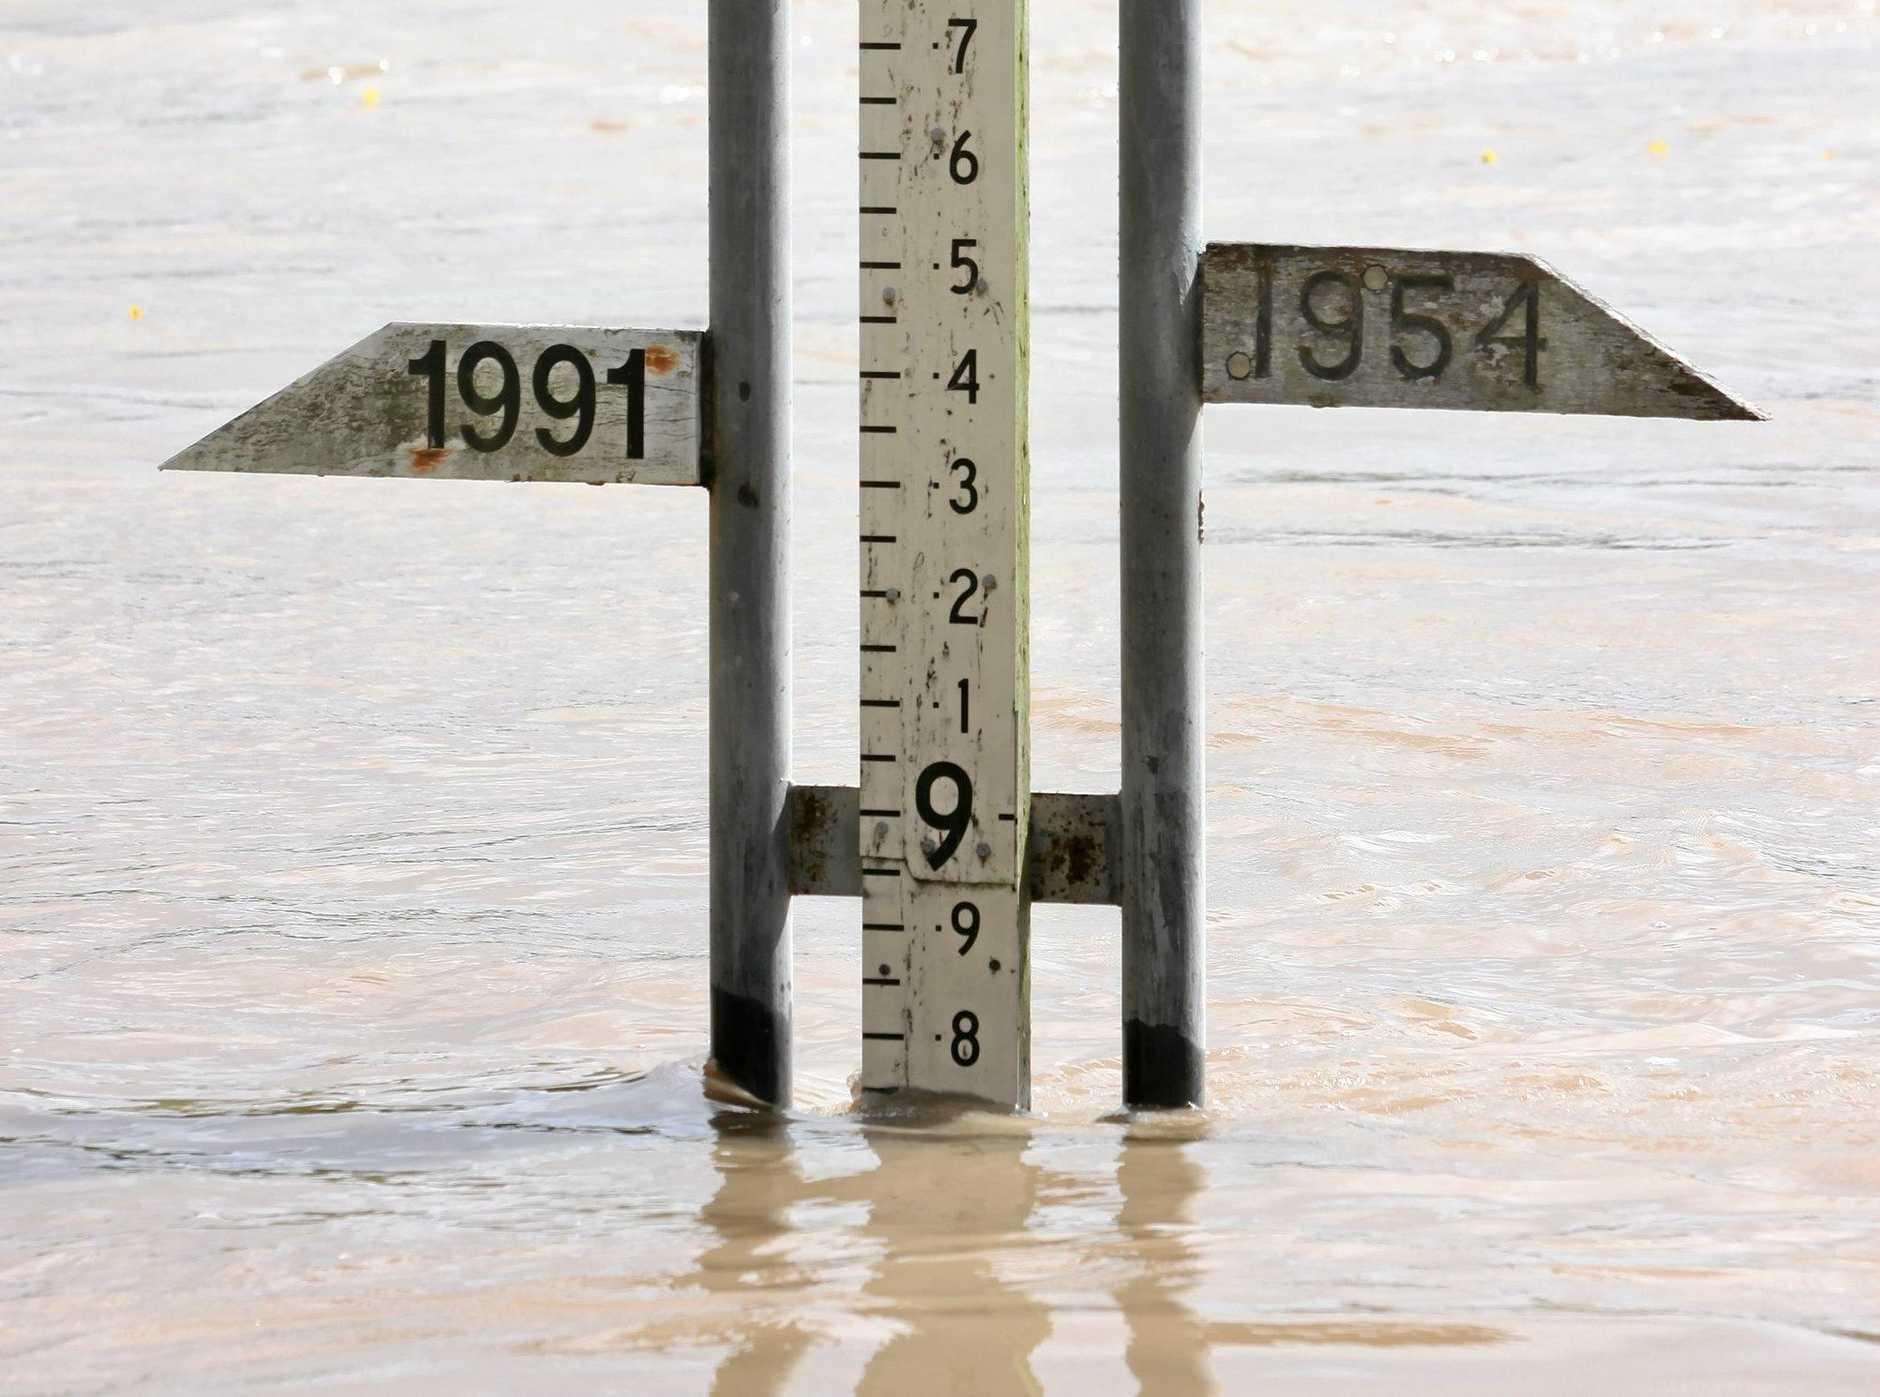 Flood gauge at Rockhampton at 9AM  as Fitzroy River in flood at level 8.75 metres. Photo Chris Ison / The Morning Bulletin   ROK020111-flood-c1